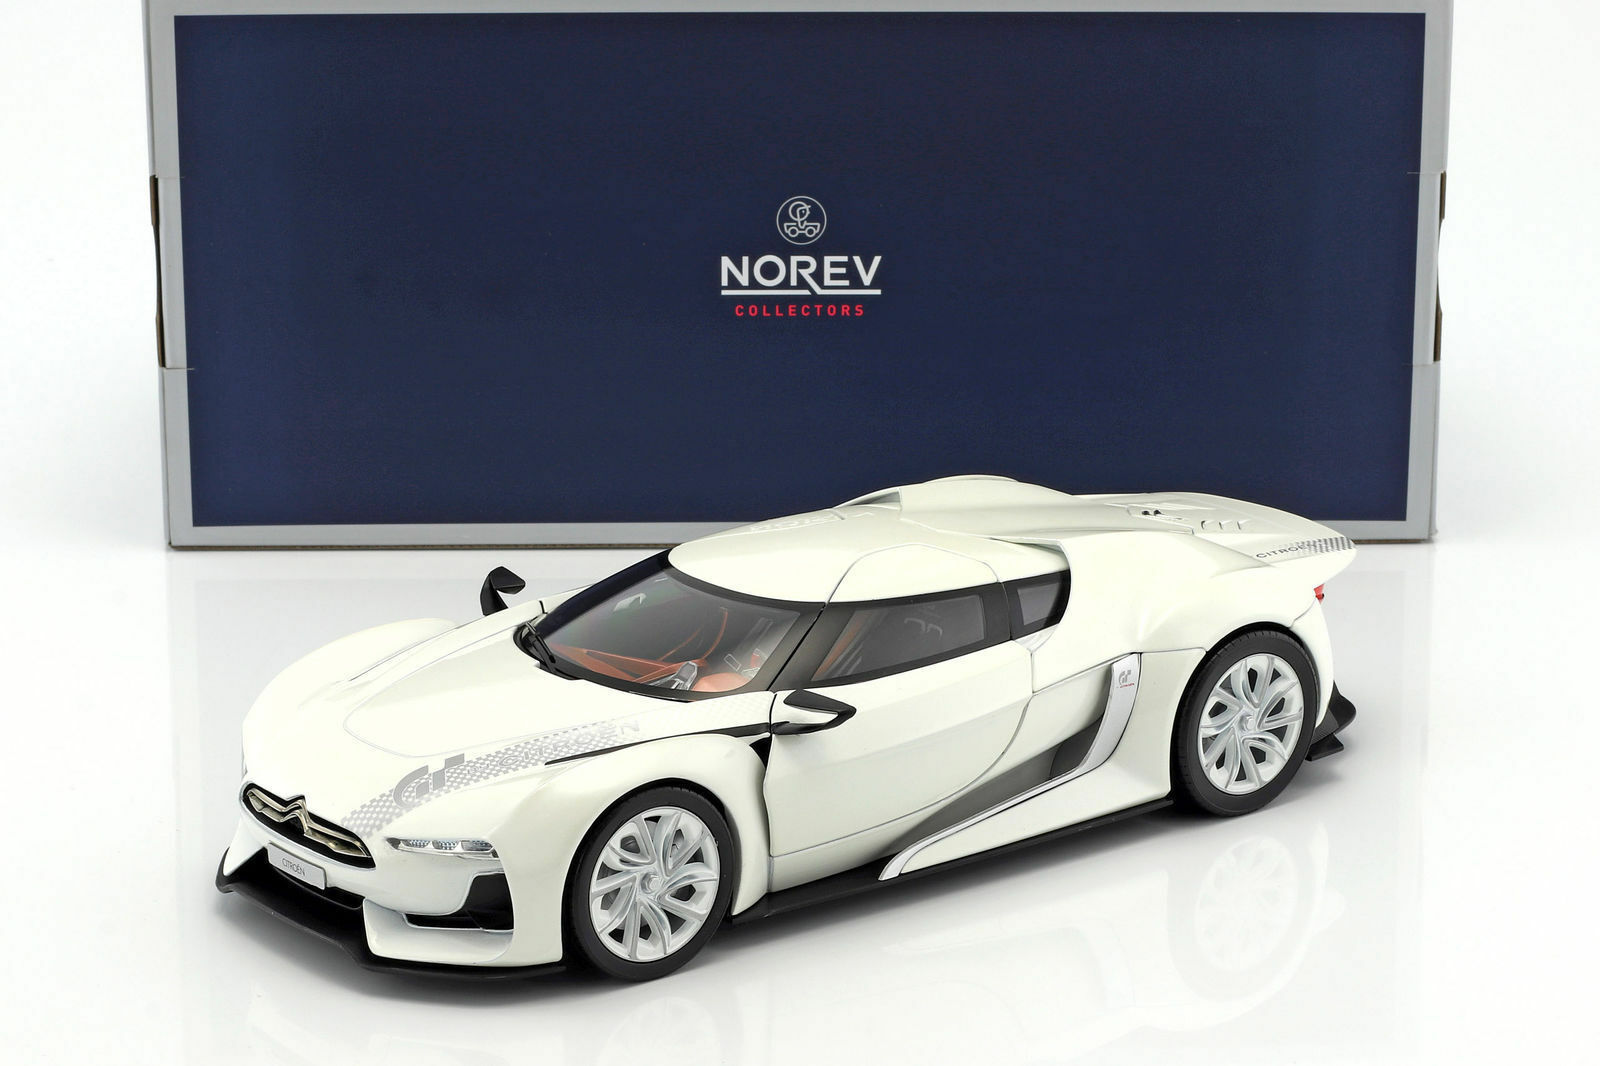 NOREV 1 18 CITROEN GT CONCEPT DIECAST CAR 181610 Weiß